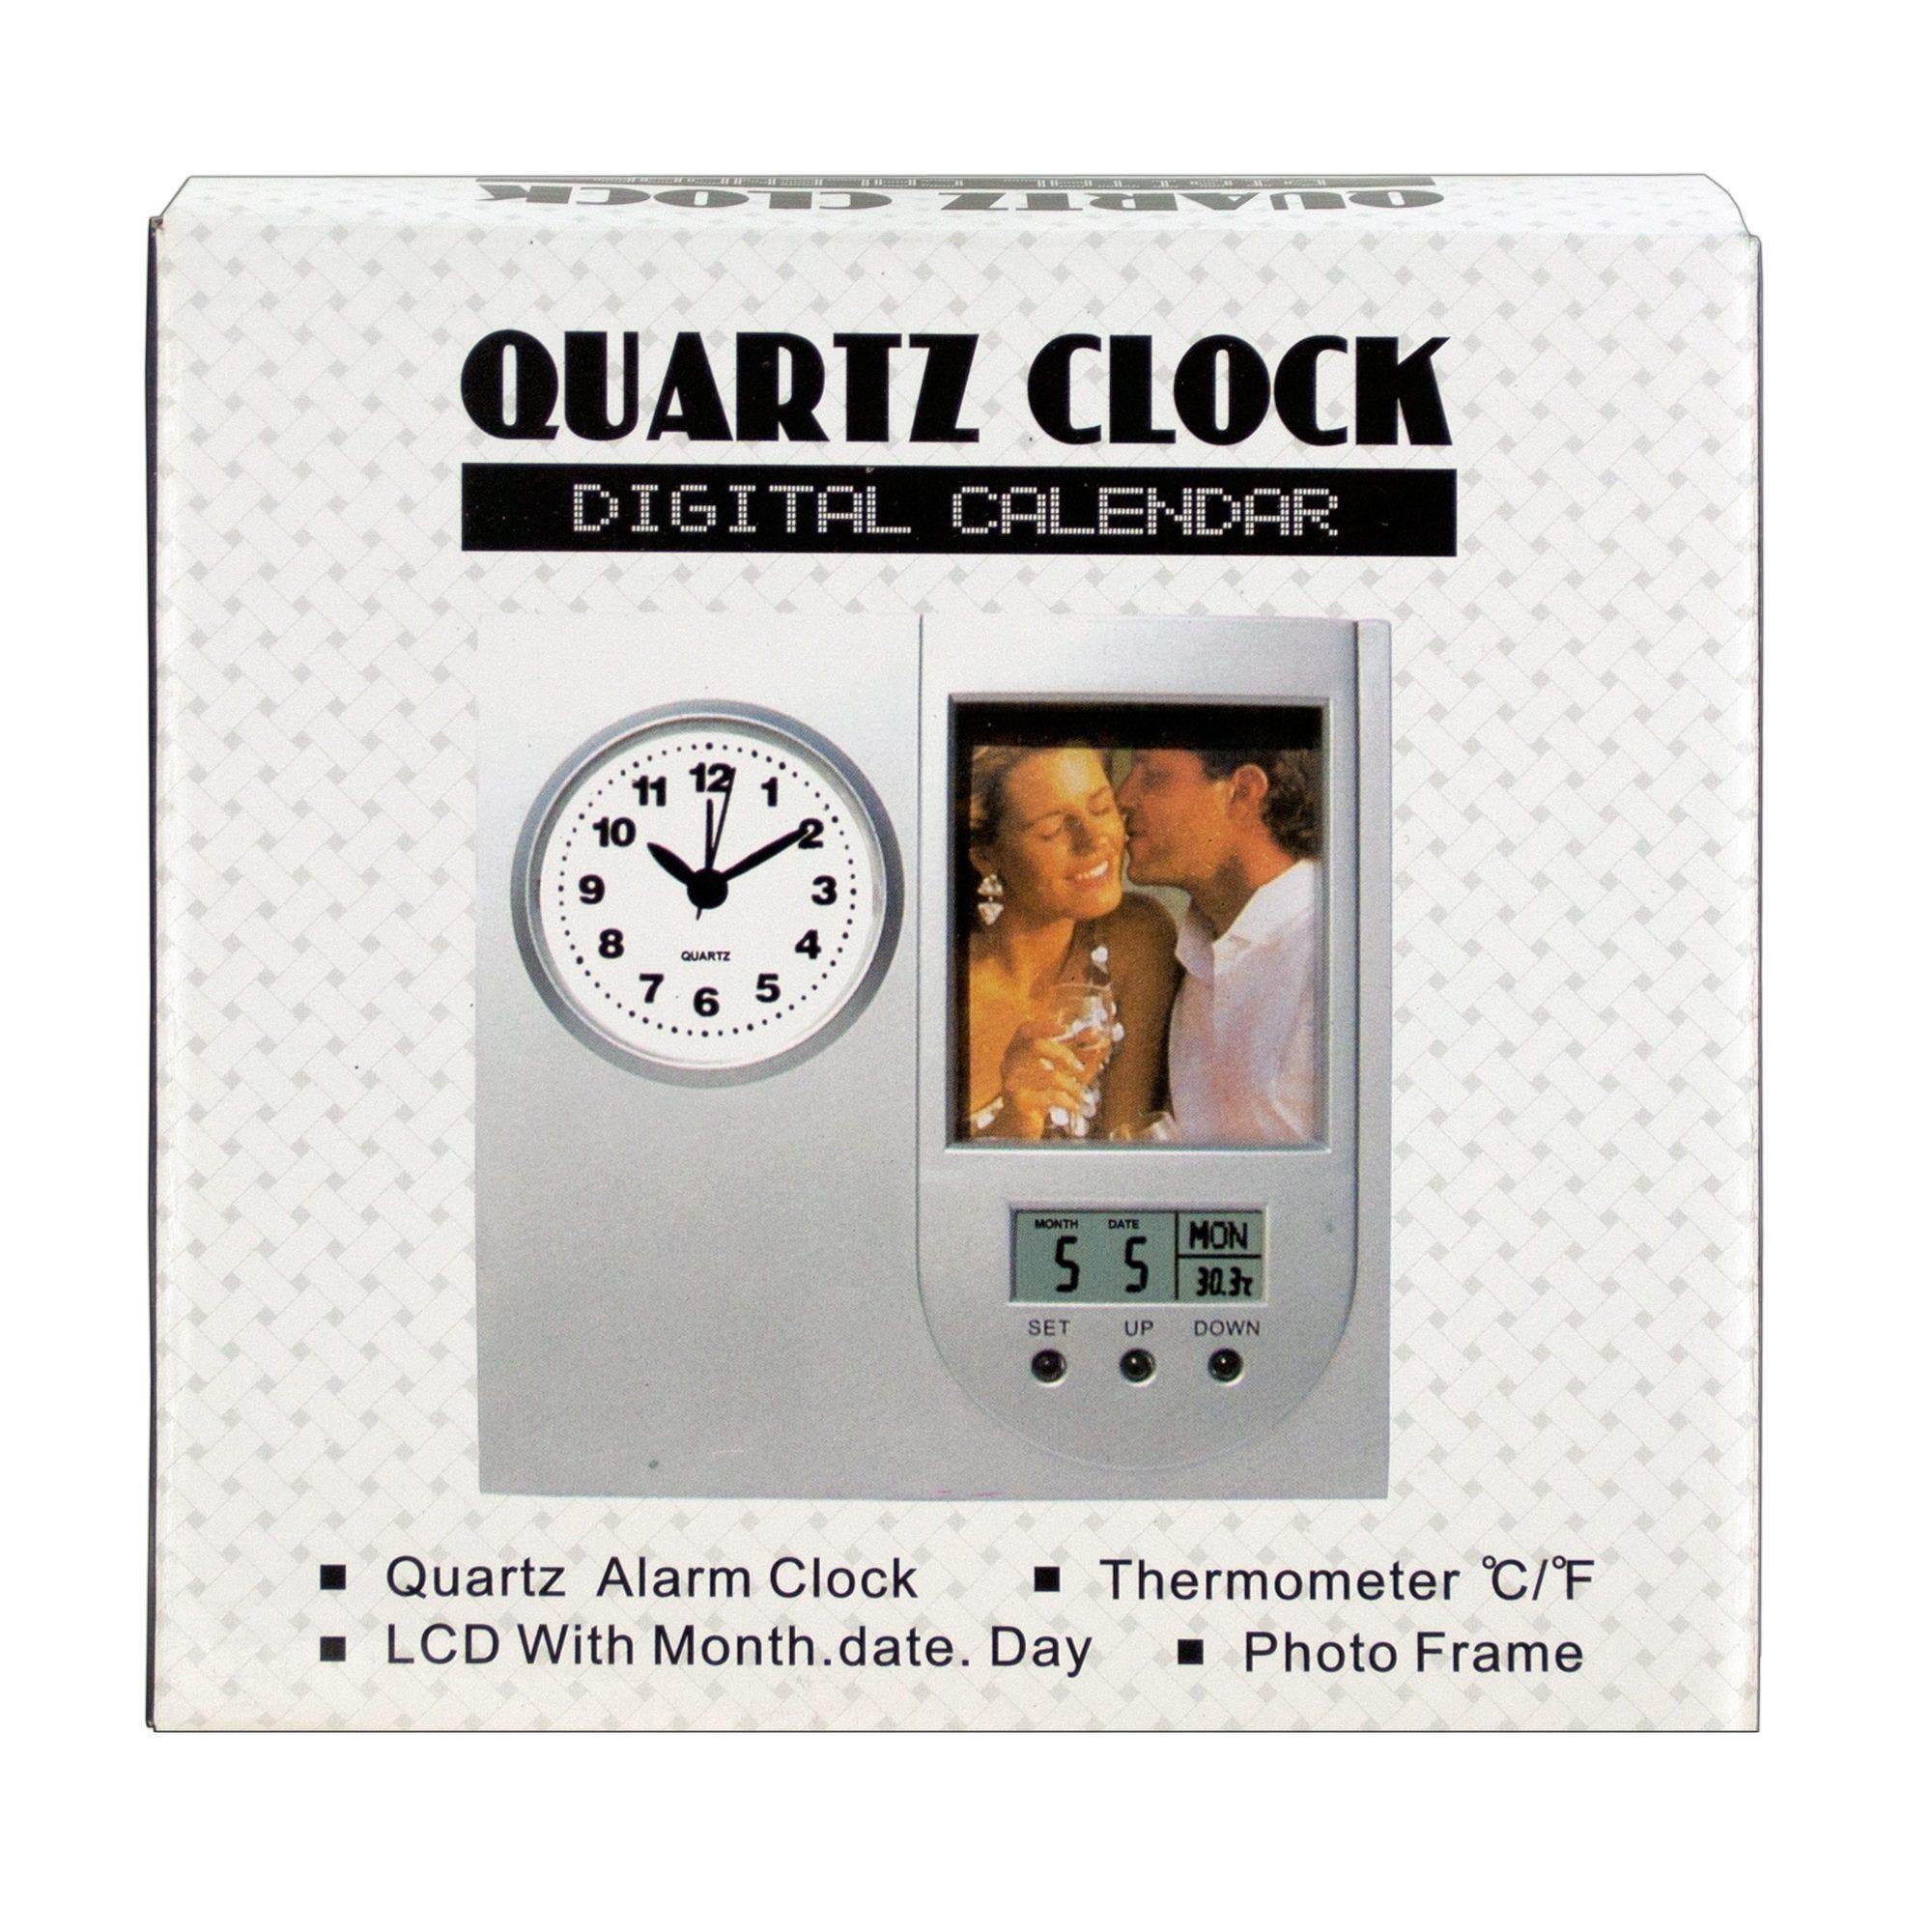 Dual Display Photo Frame Quartz Alarm Clock- Qty 8